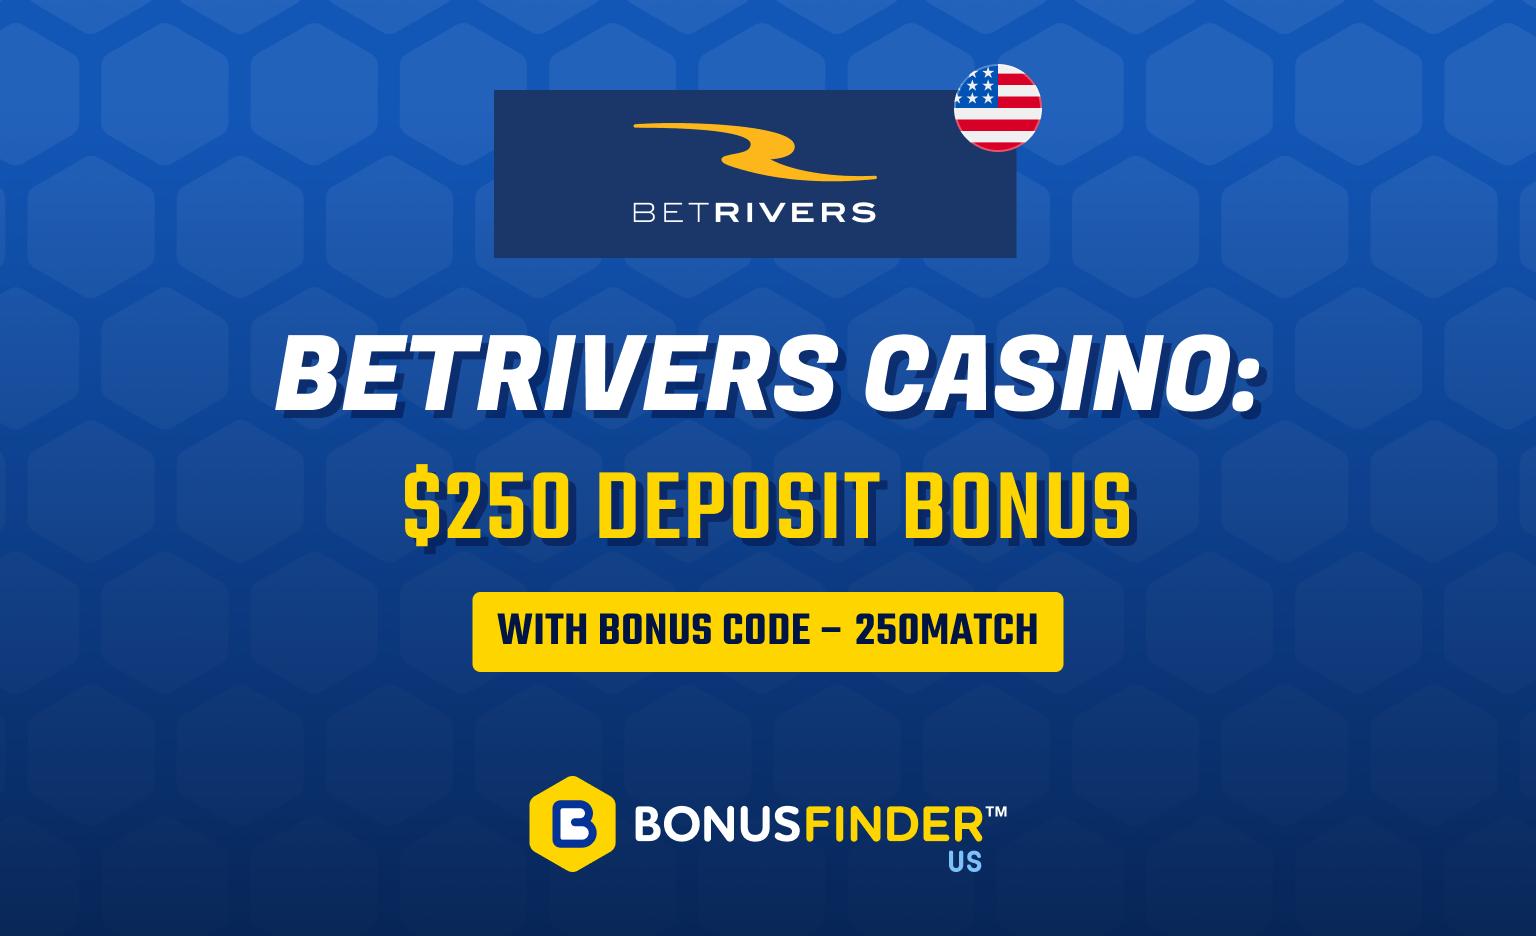 BetRivers Casino bonus